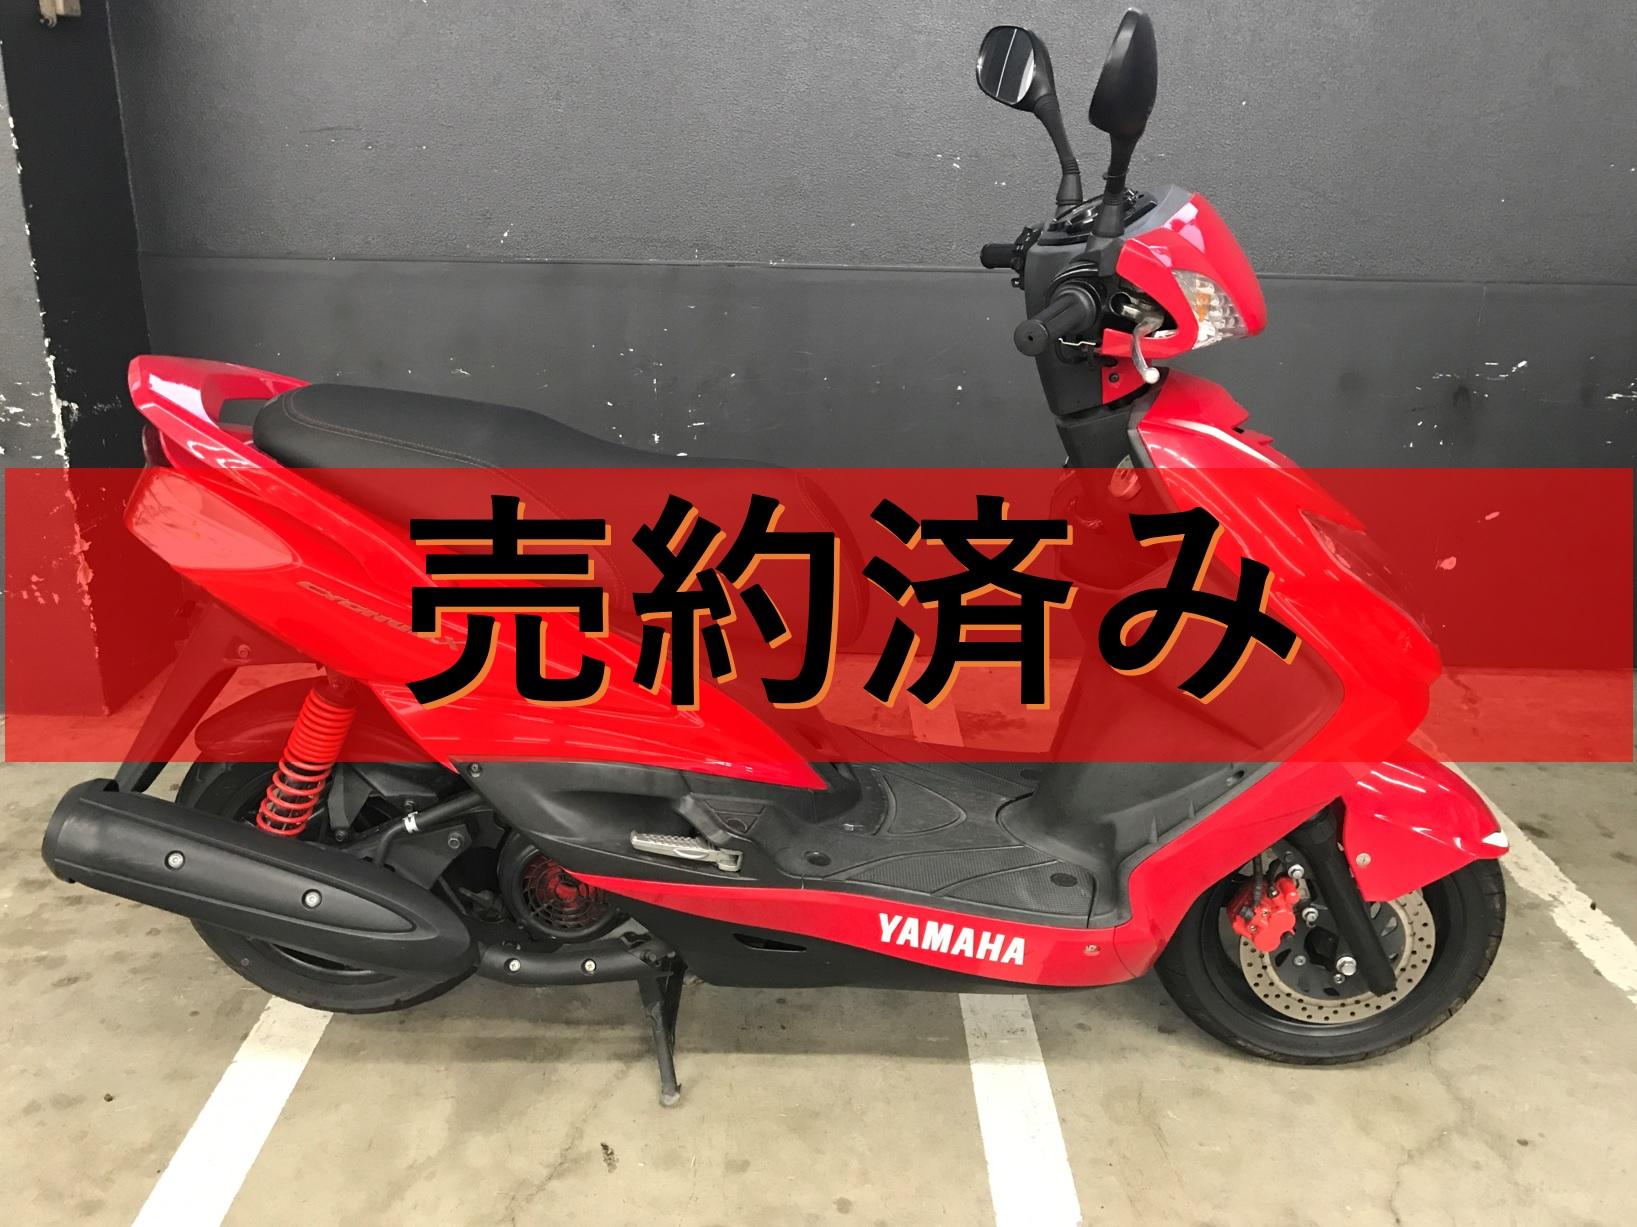 YAMAHA 【販売車両】シグナスX